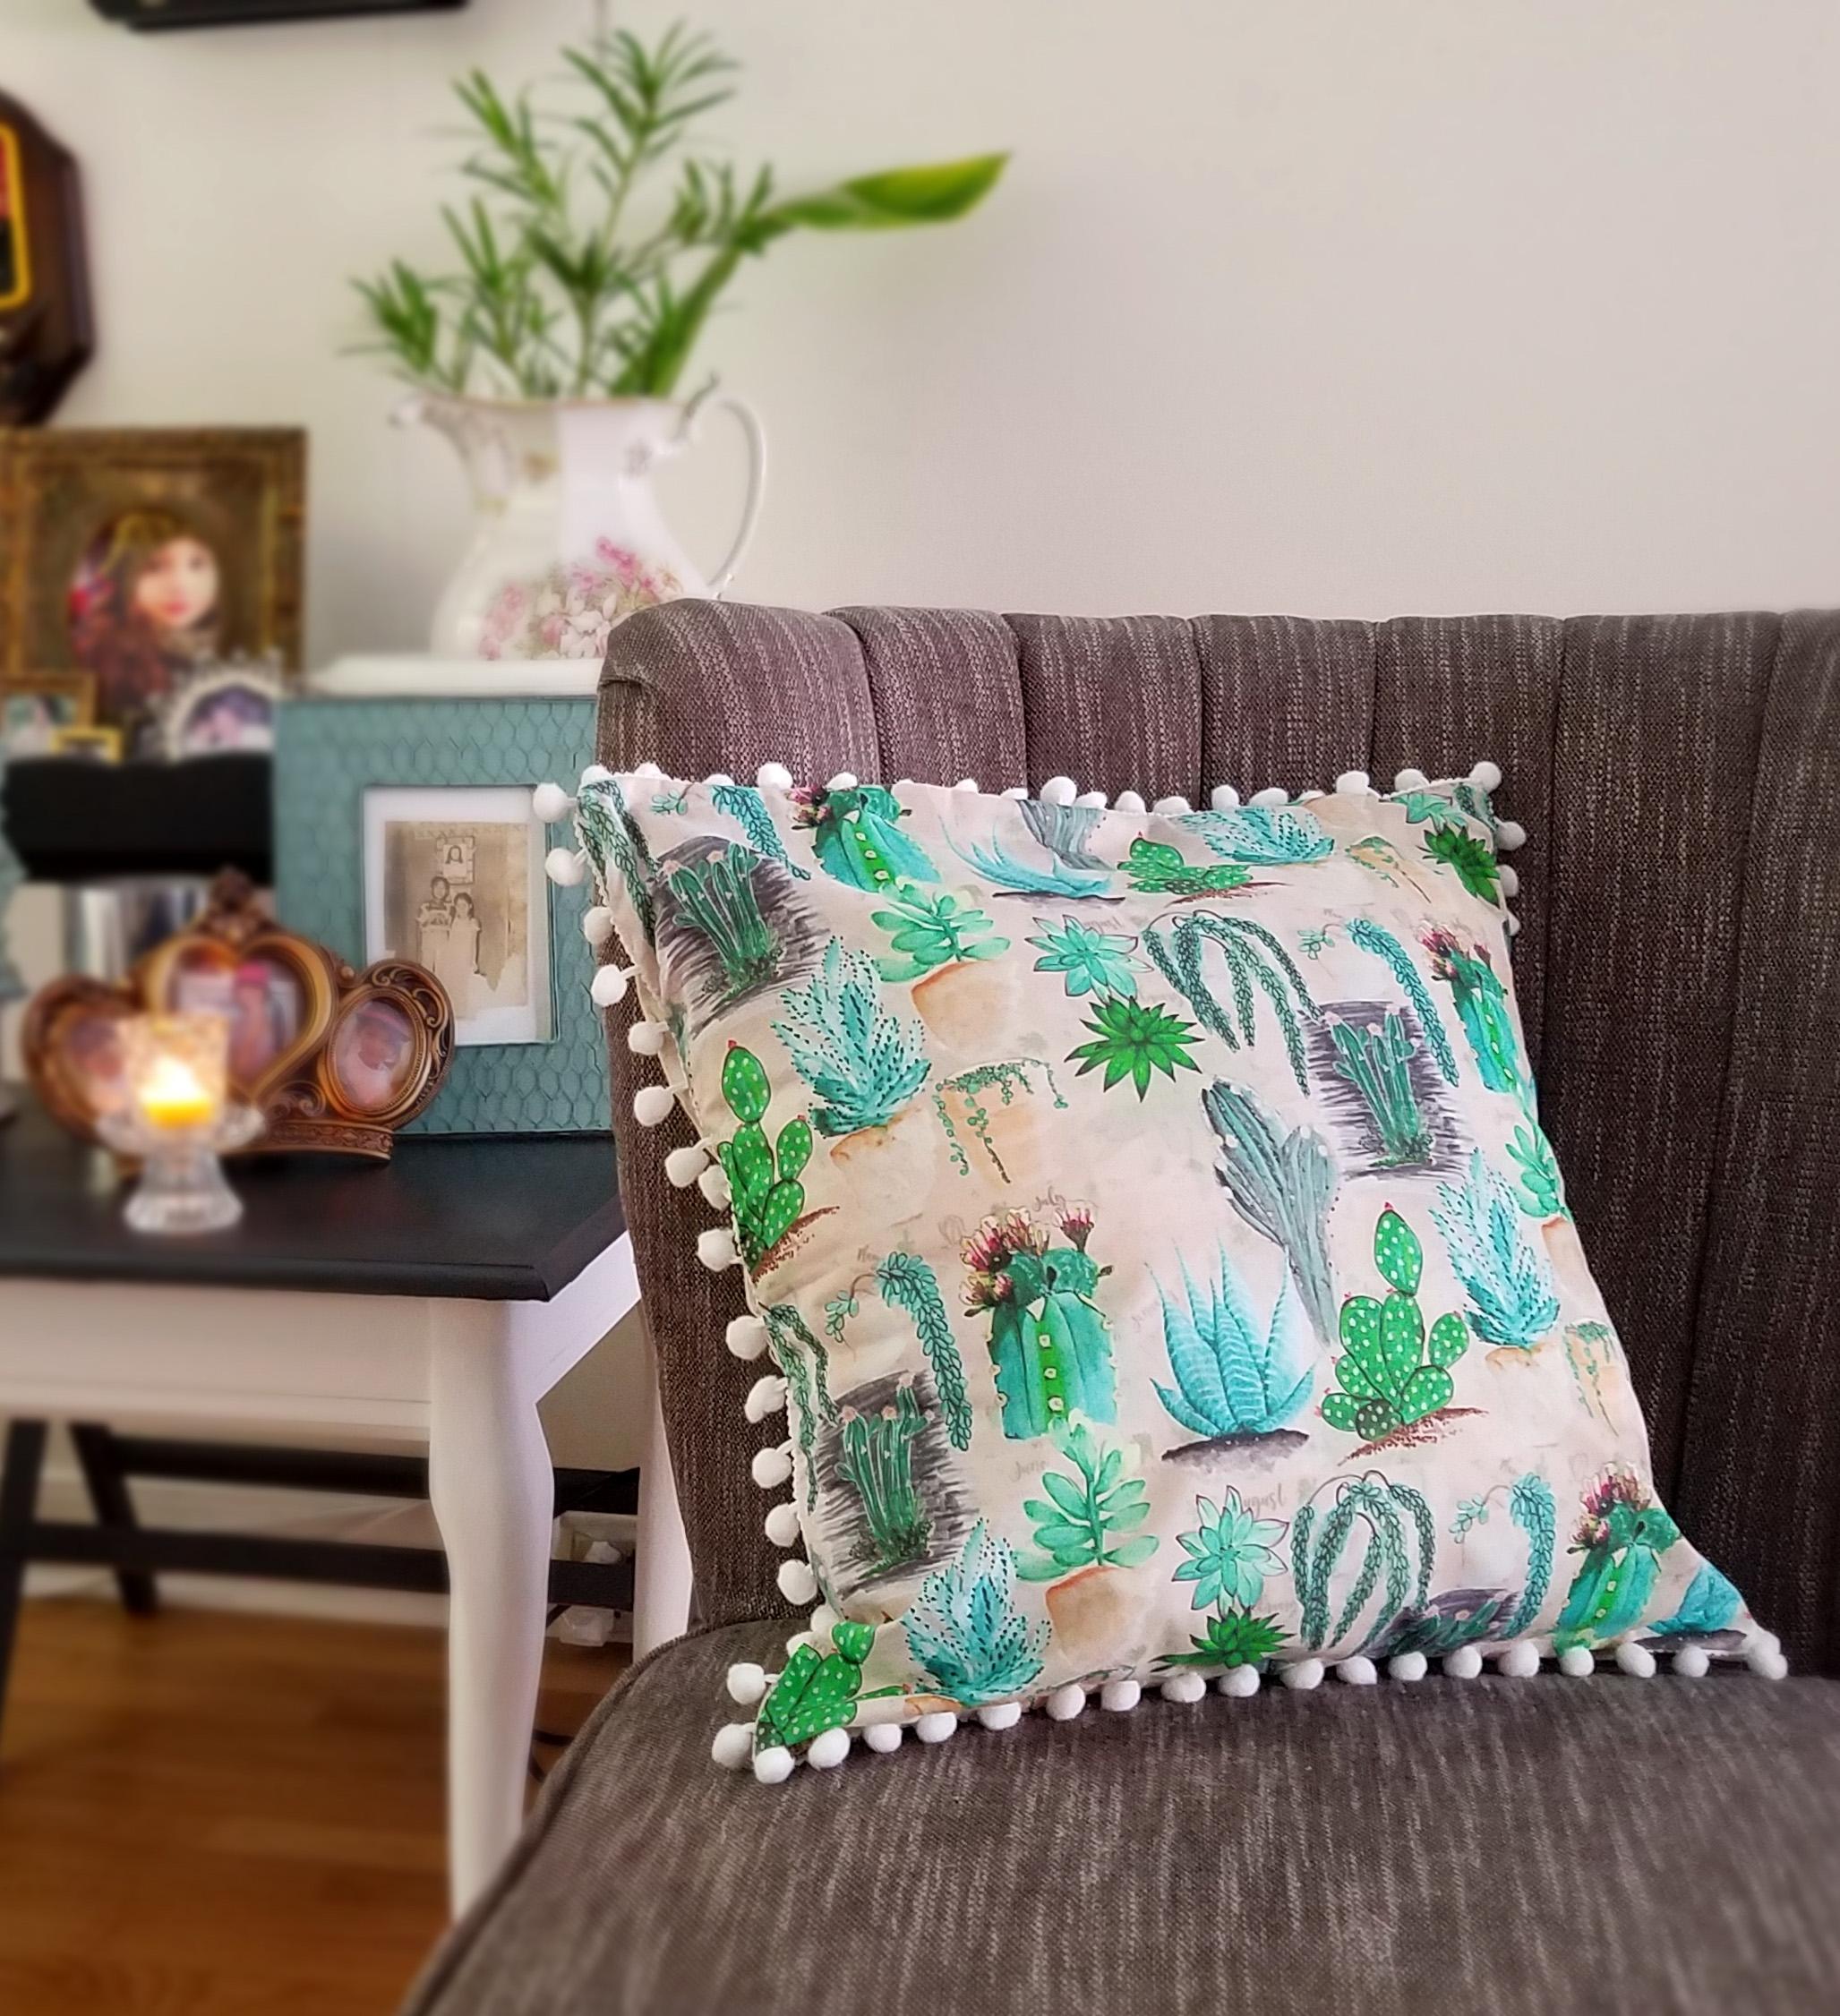 Succulent pillowcase